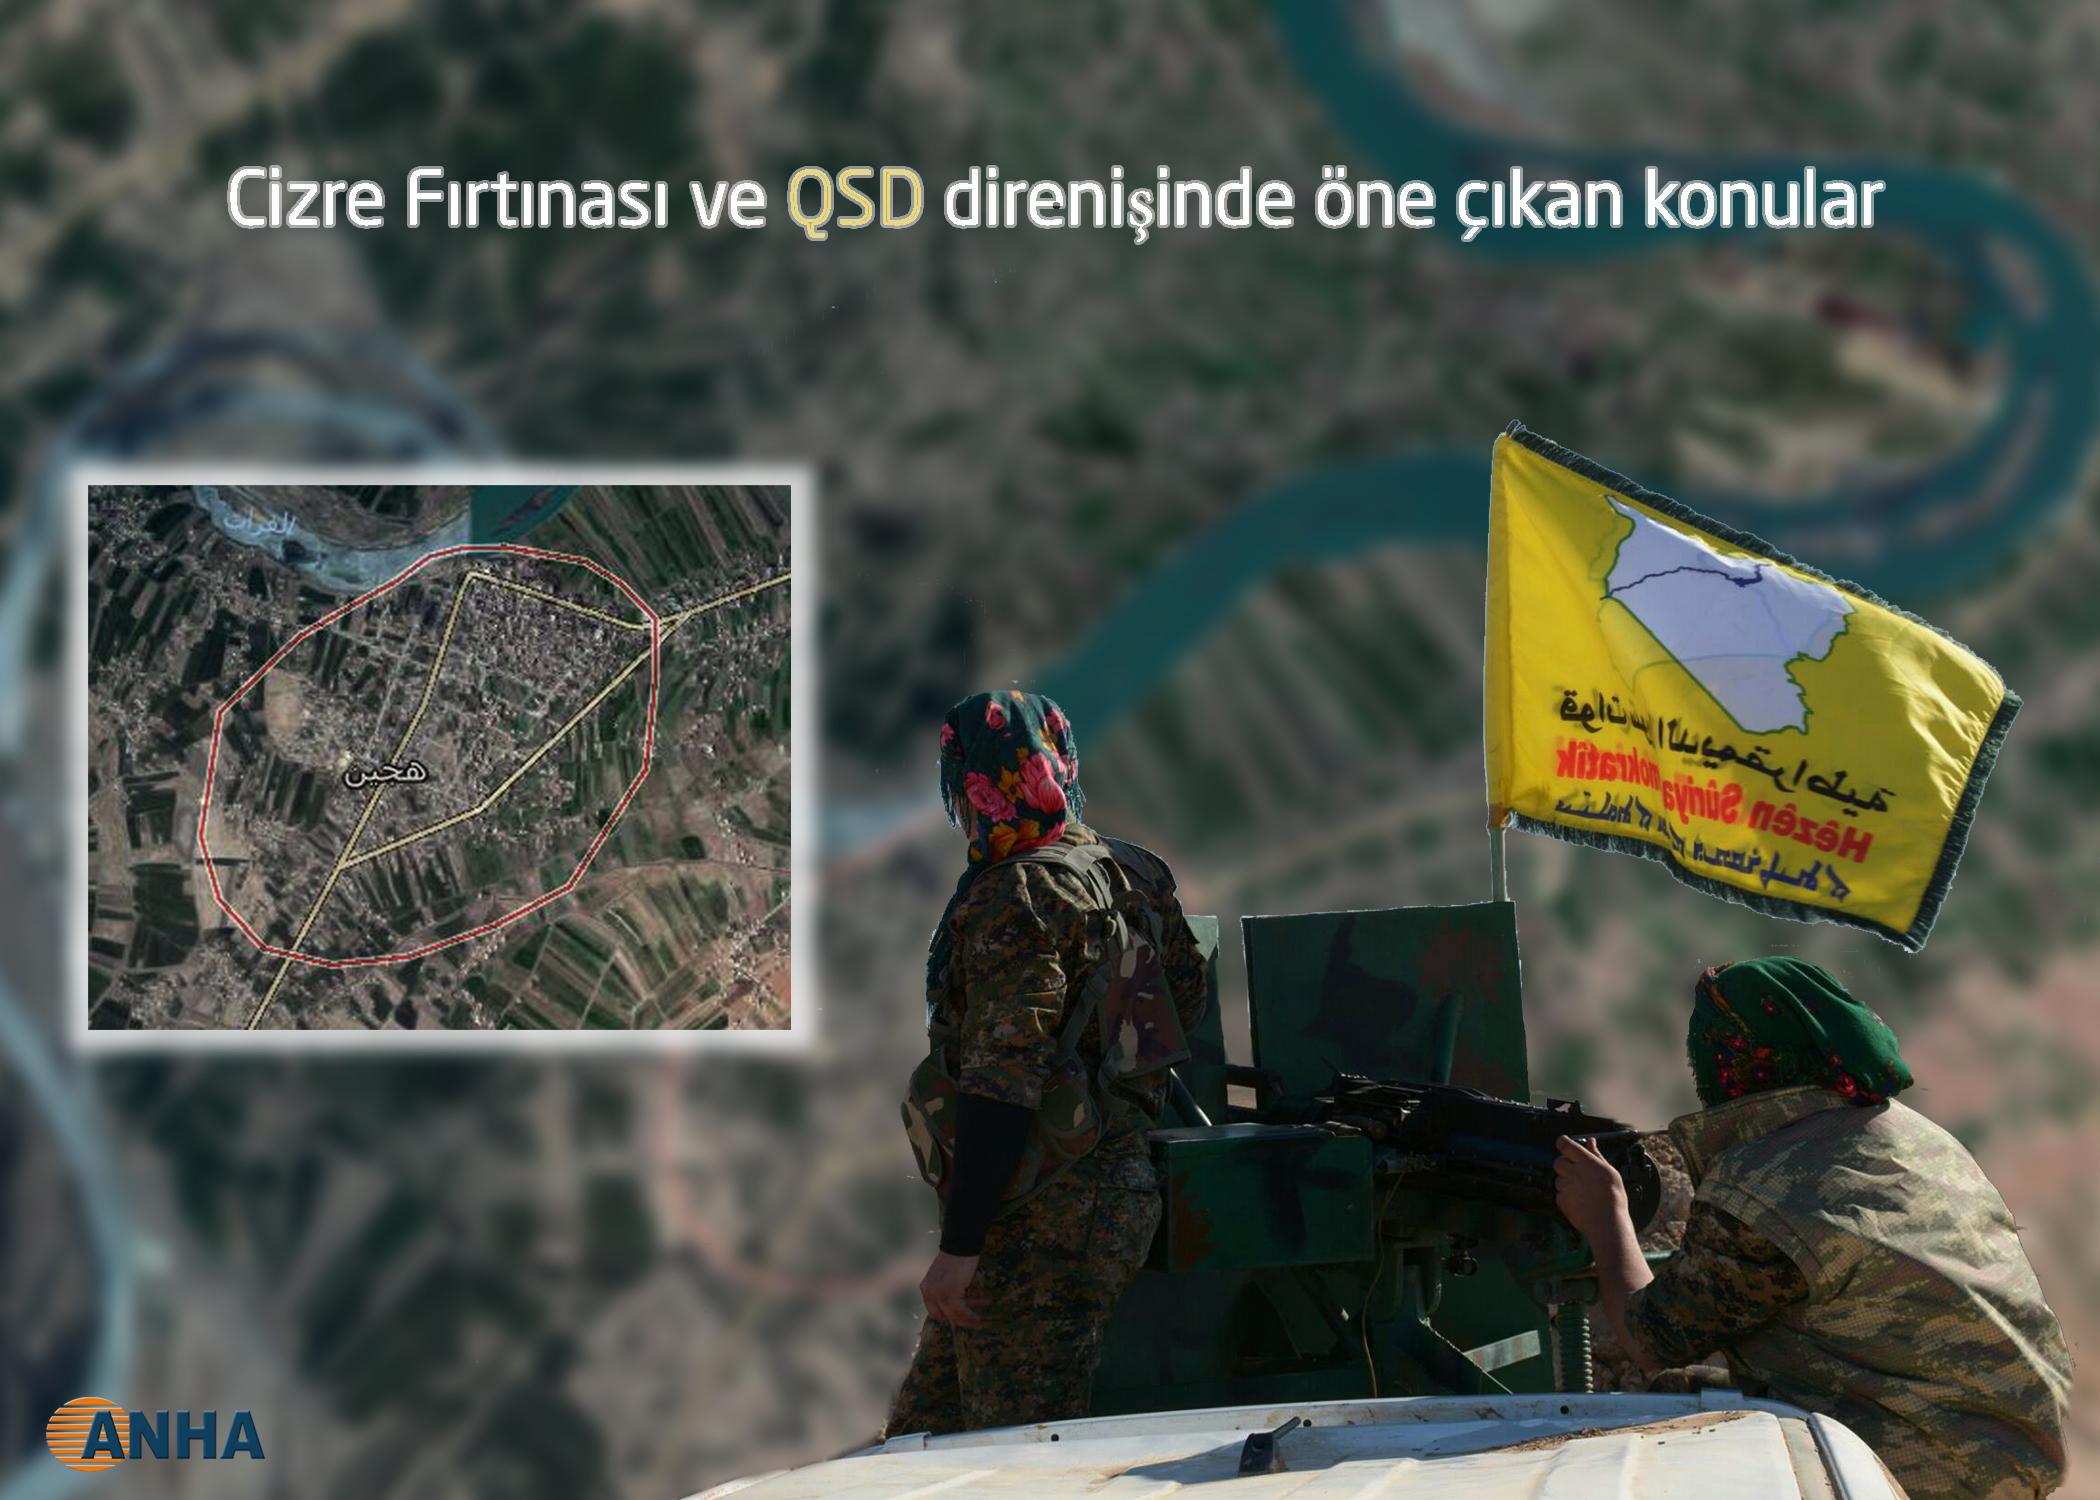 QSD Hecin'e operasyon hazırlığında